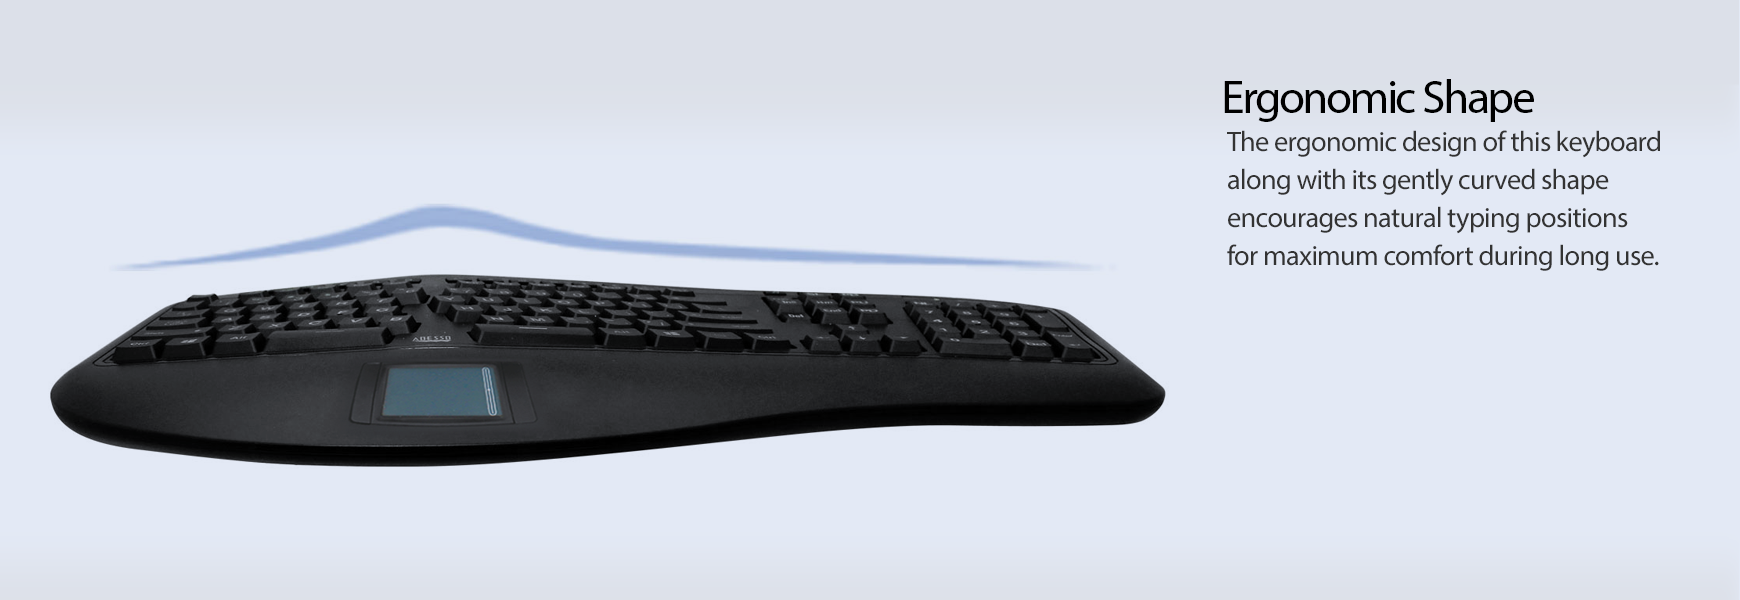 3D Ergonomic Touchpad Keyboard